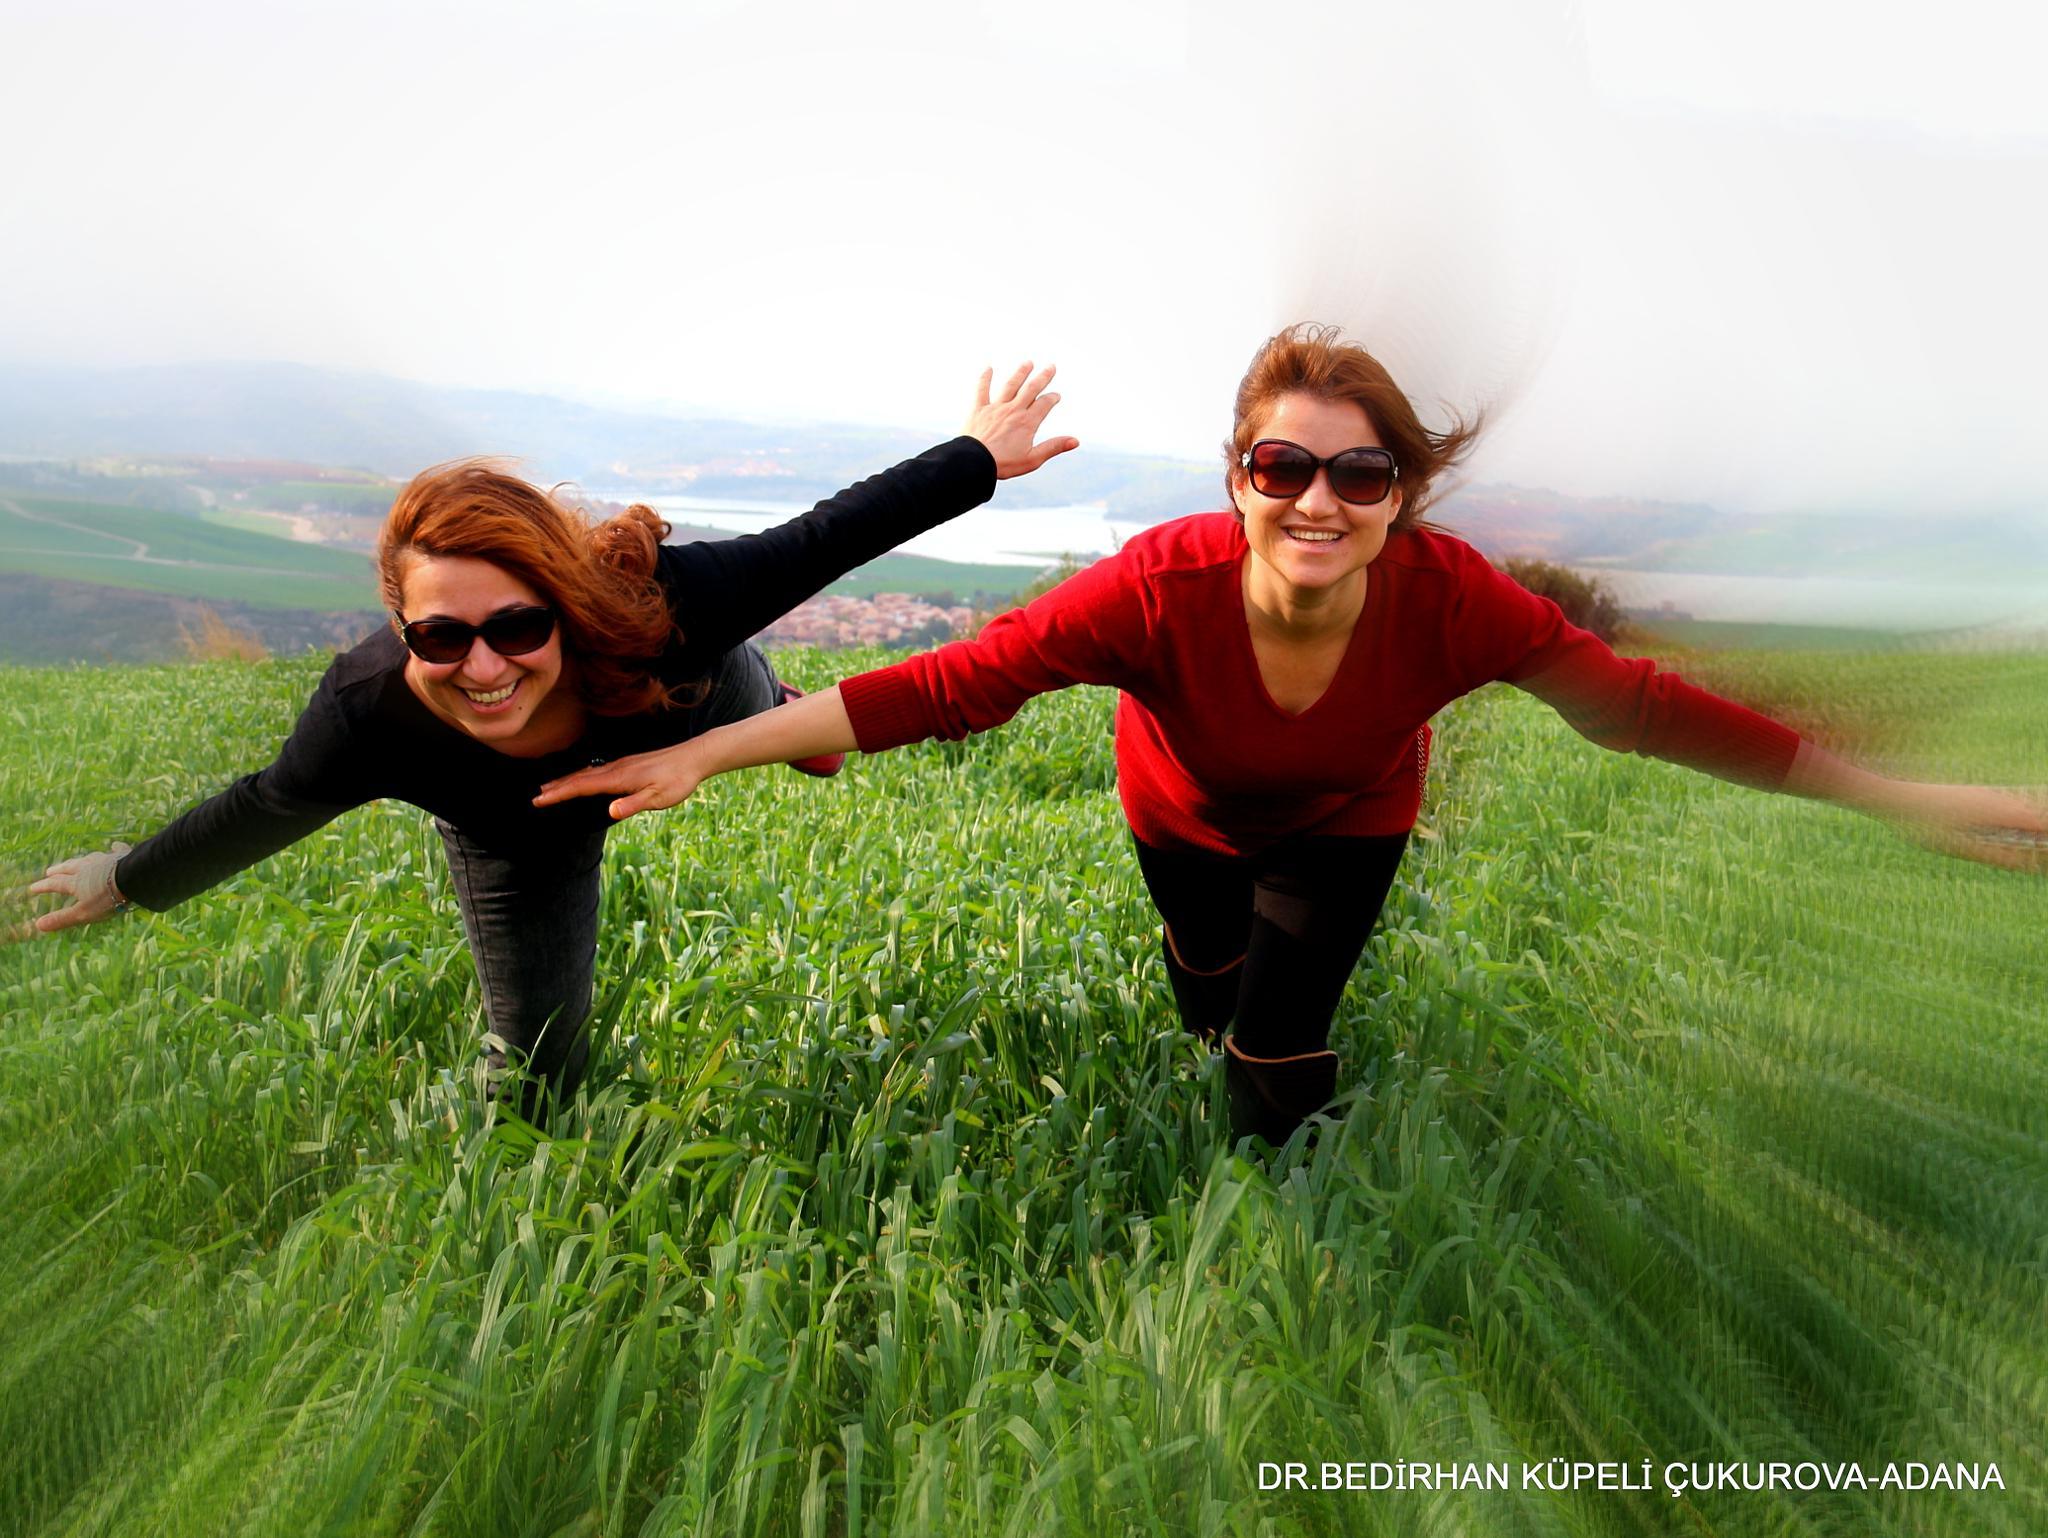 fly on the grass by Bedirhan Küpeli